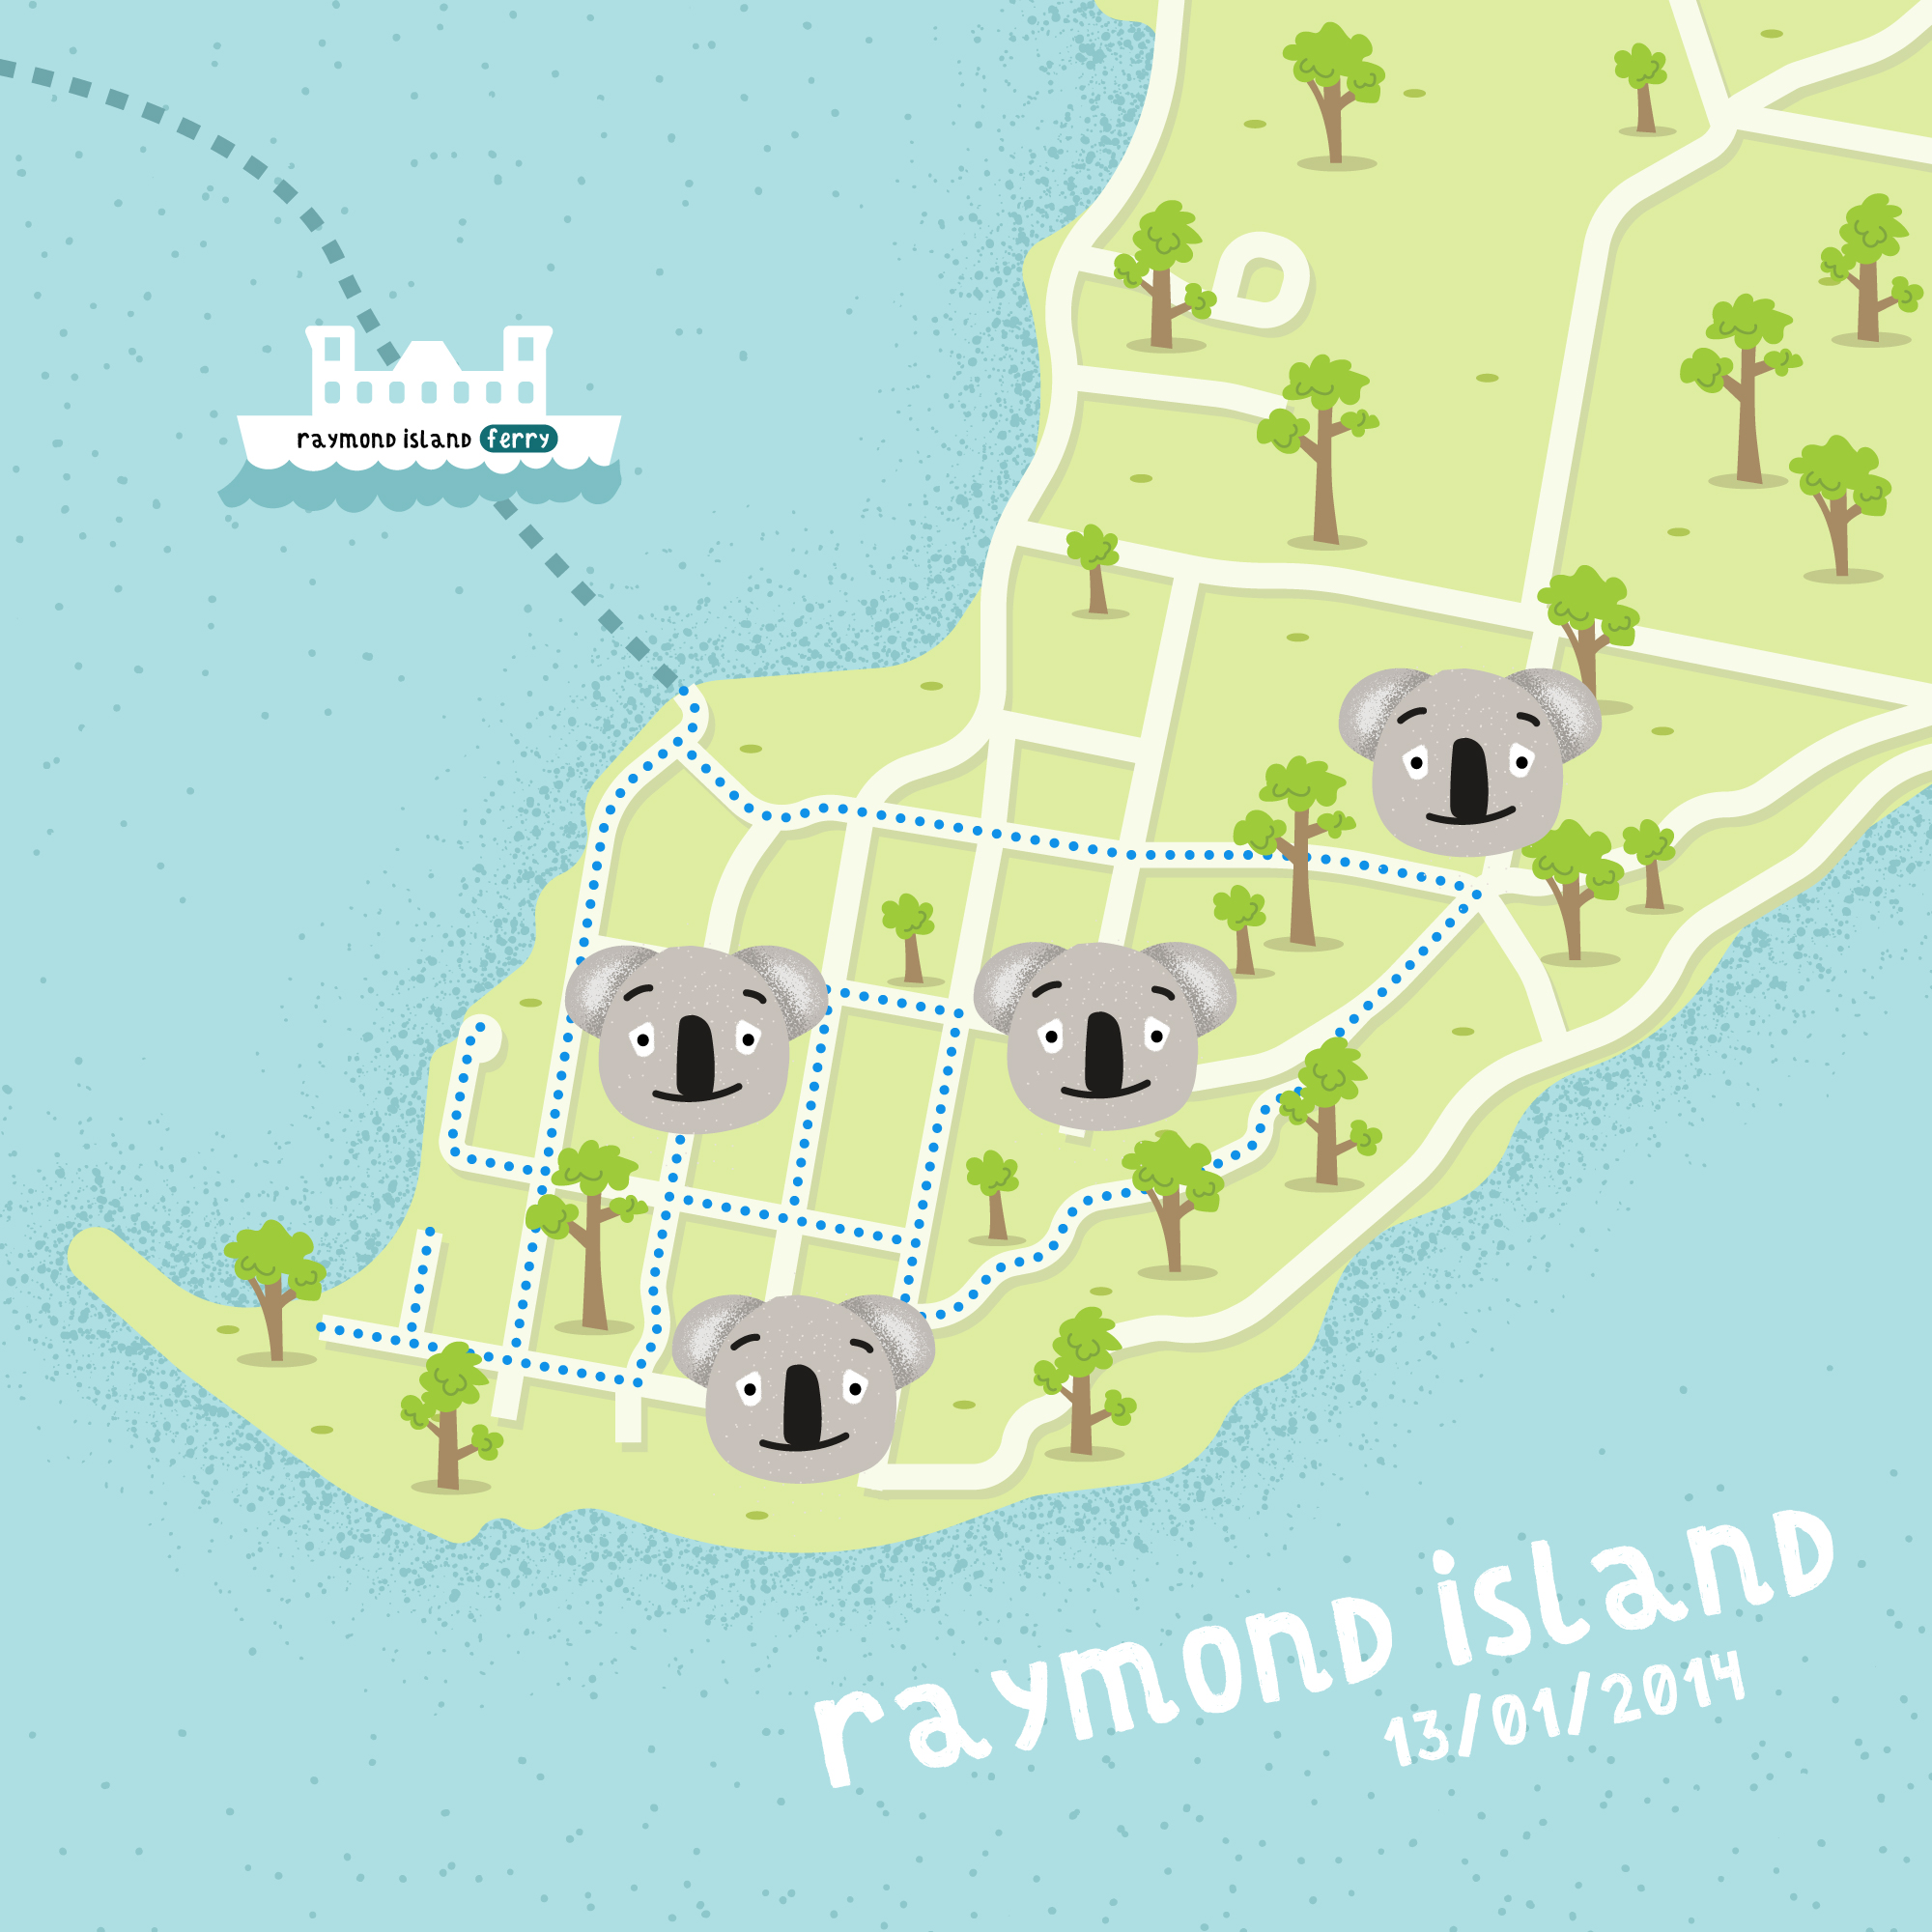 Raymond Island illustrated map